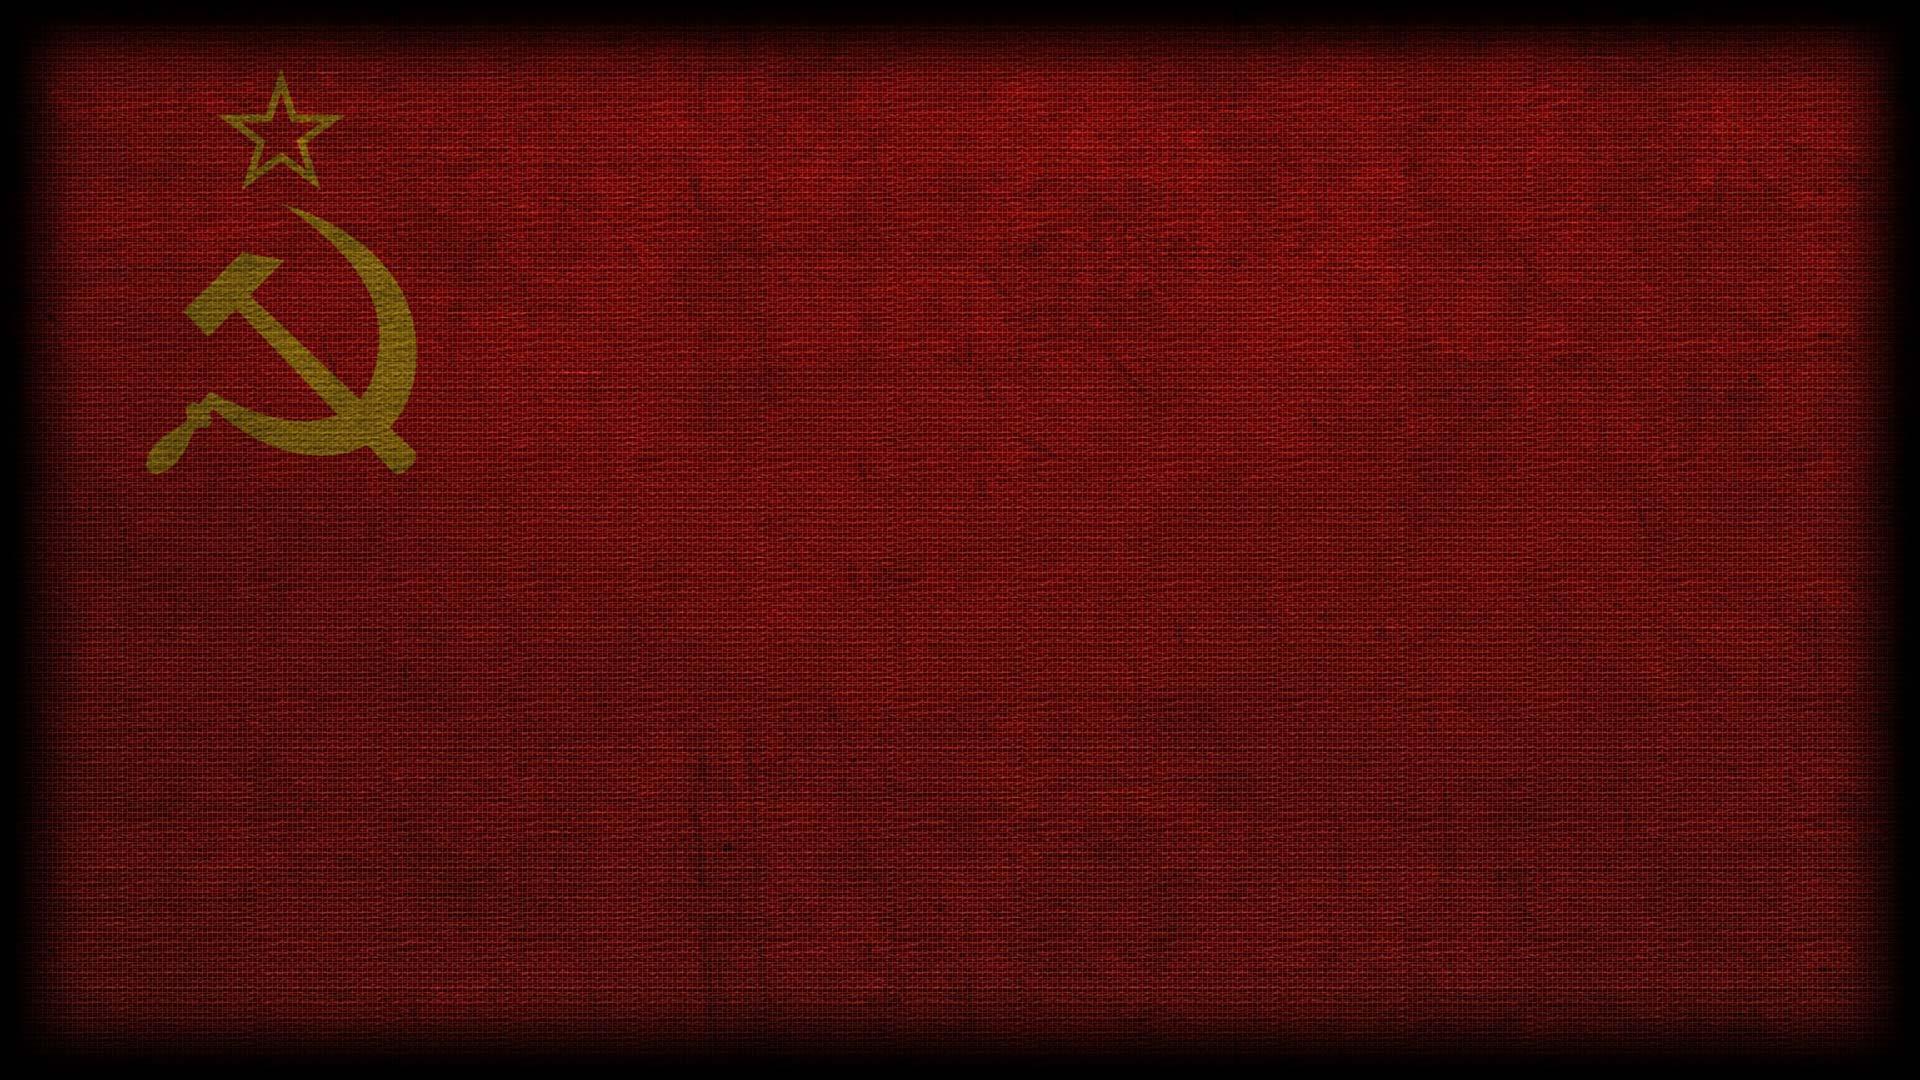 Steam Community Market Listings for 244410 USSR 1920x1080